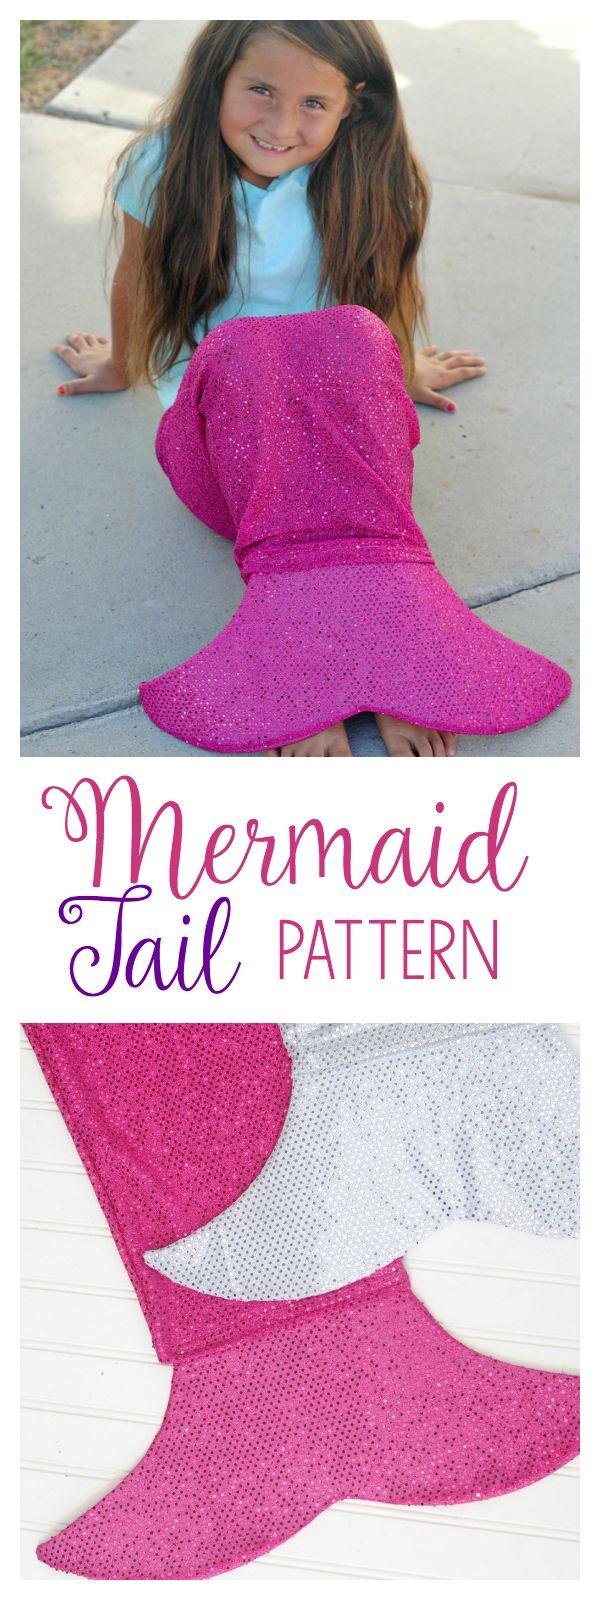 Mermaid Tail Tutorial                                                       …